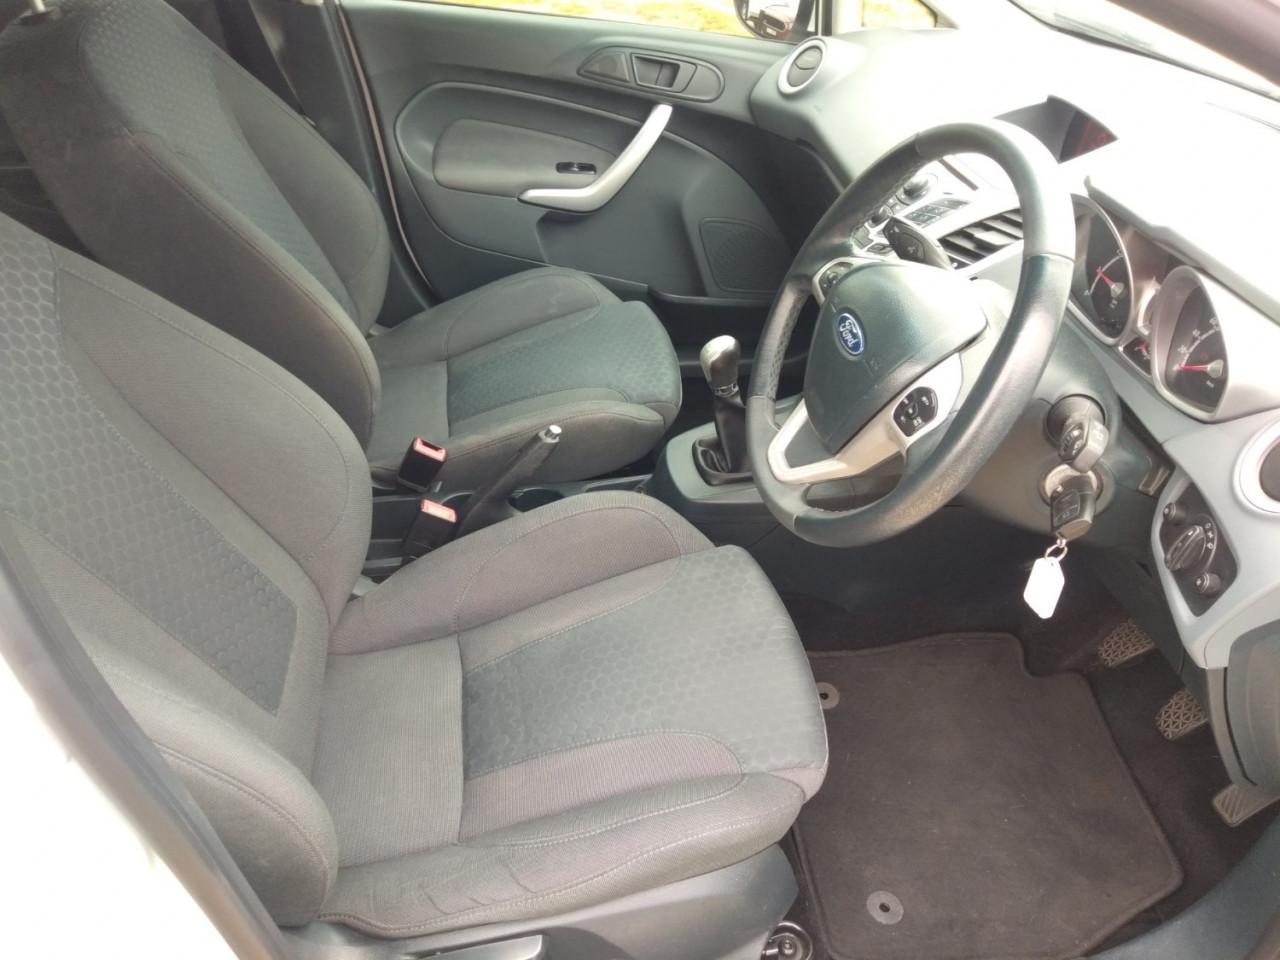 2012 Ford Fiesta WT LX Sedan Image 11